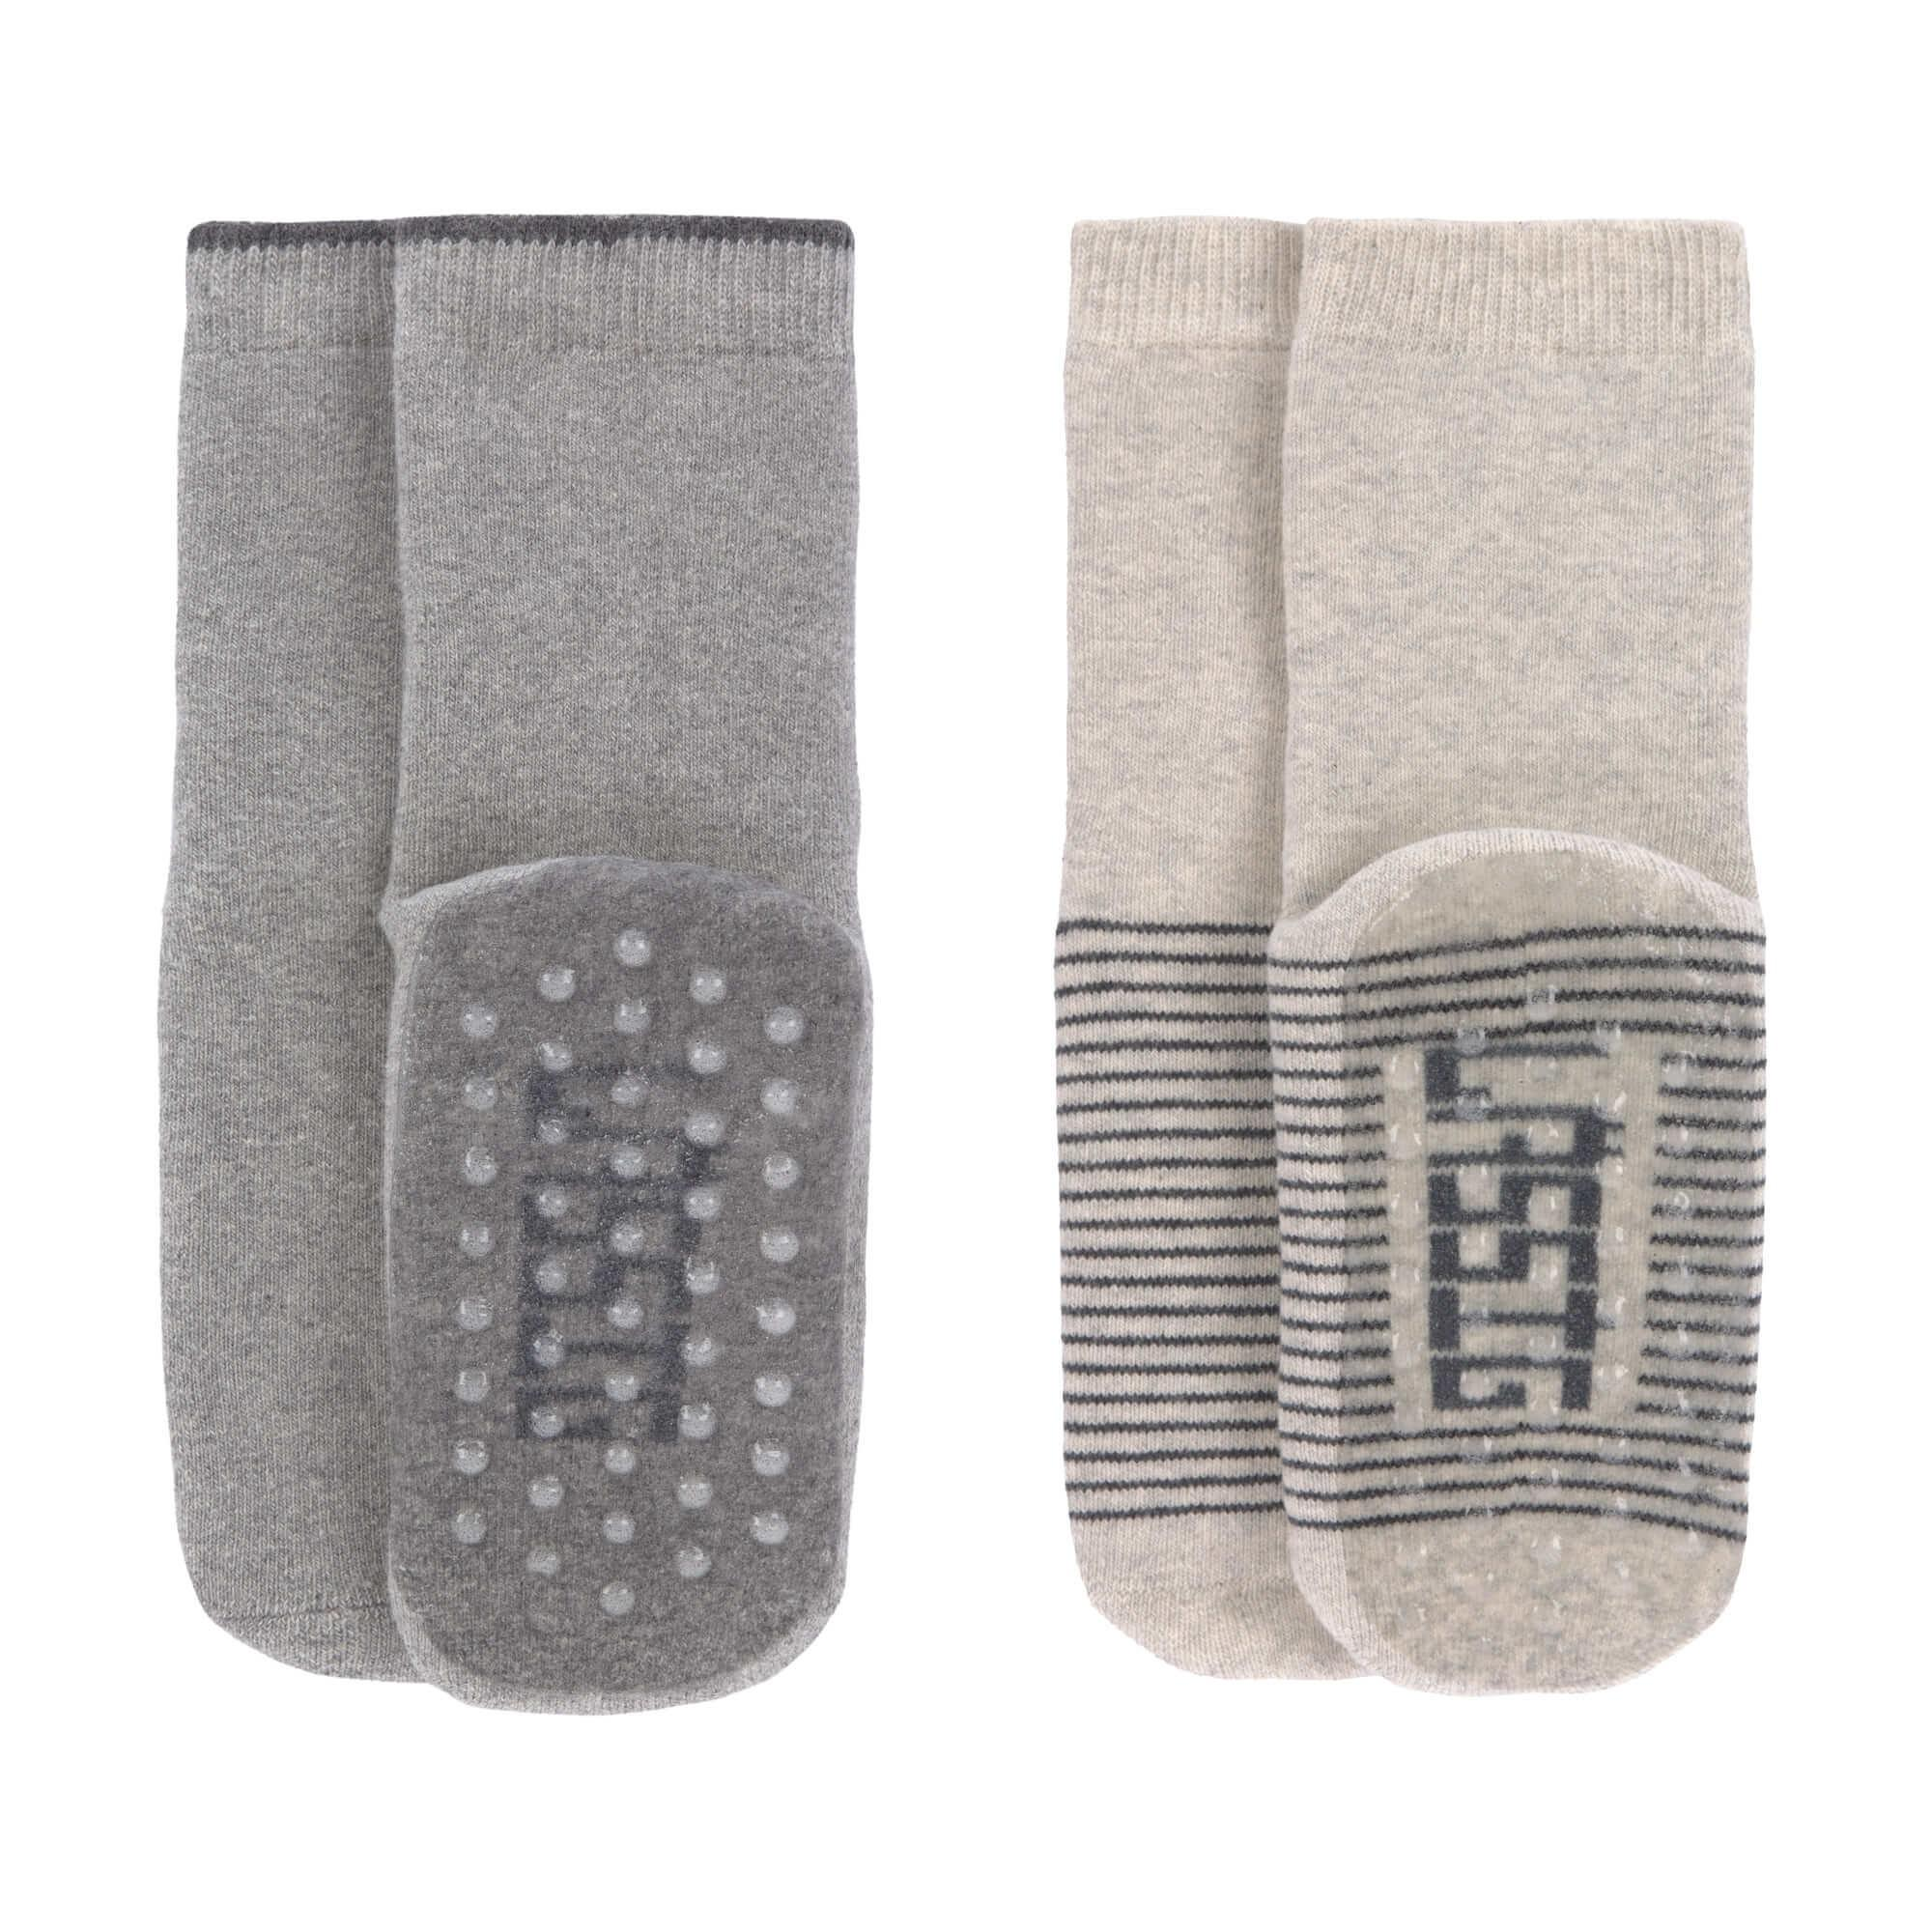 Lassig - Anti-slip Socks 2 pcs. assorted grey/beige, Size: 27-30